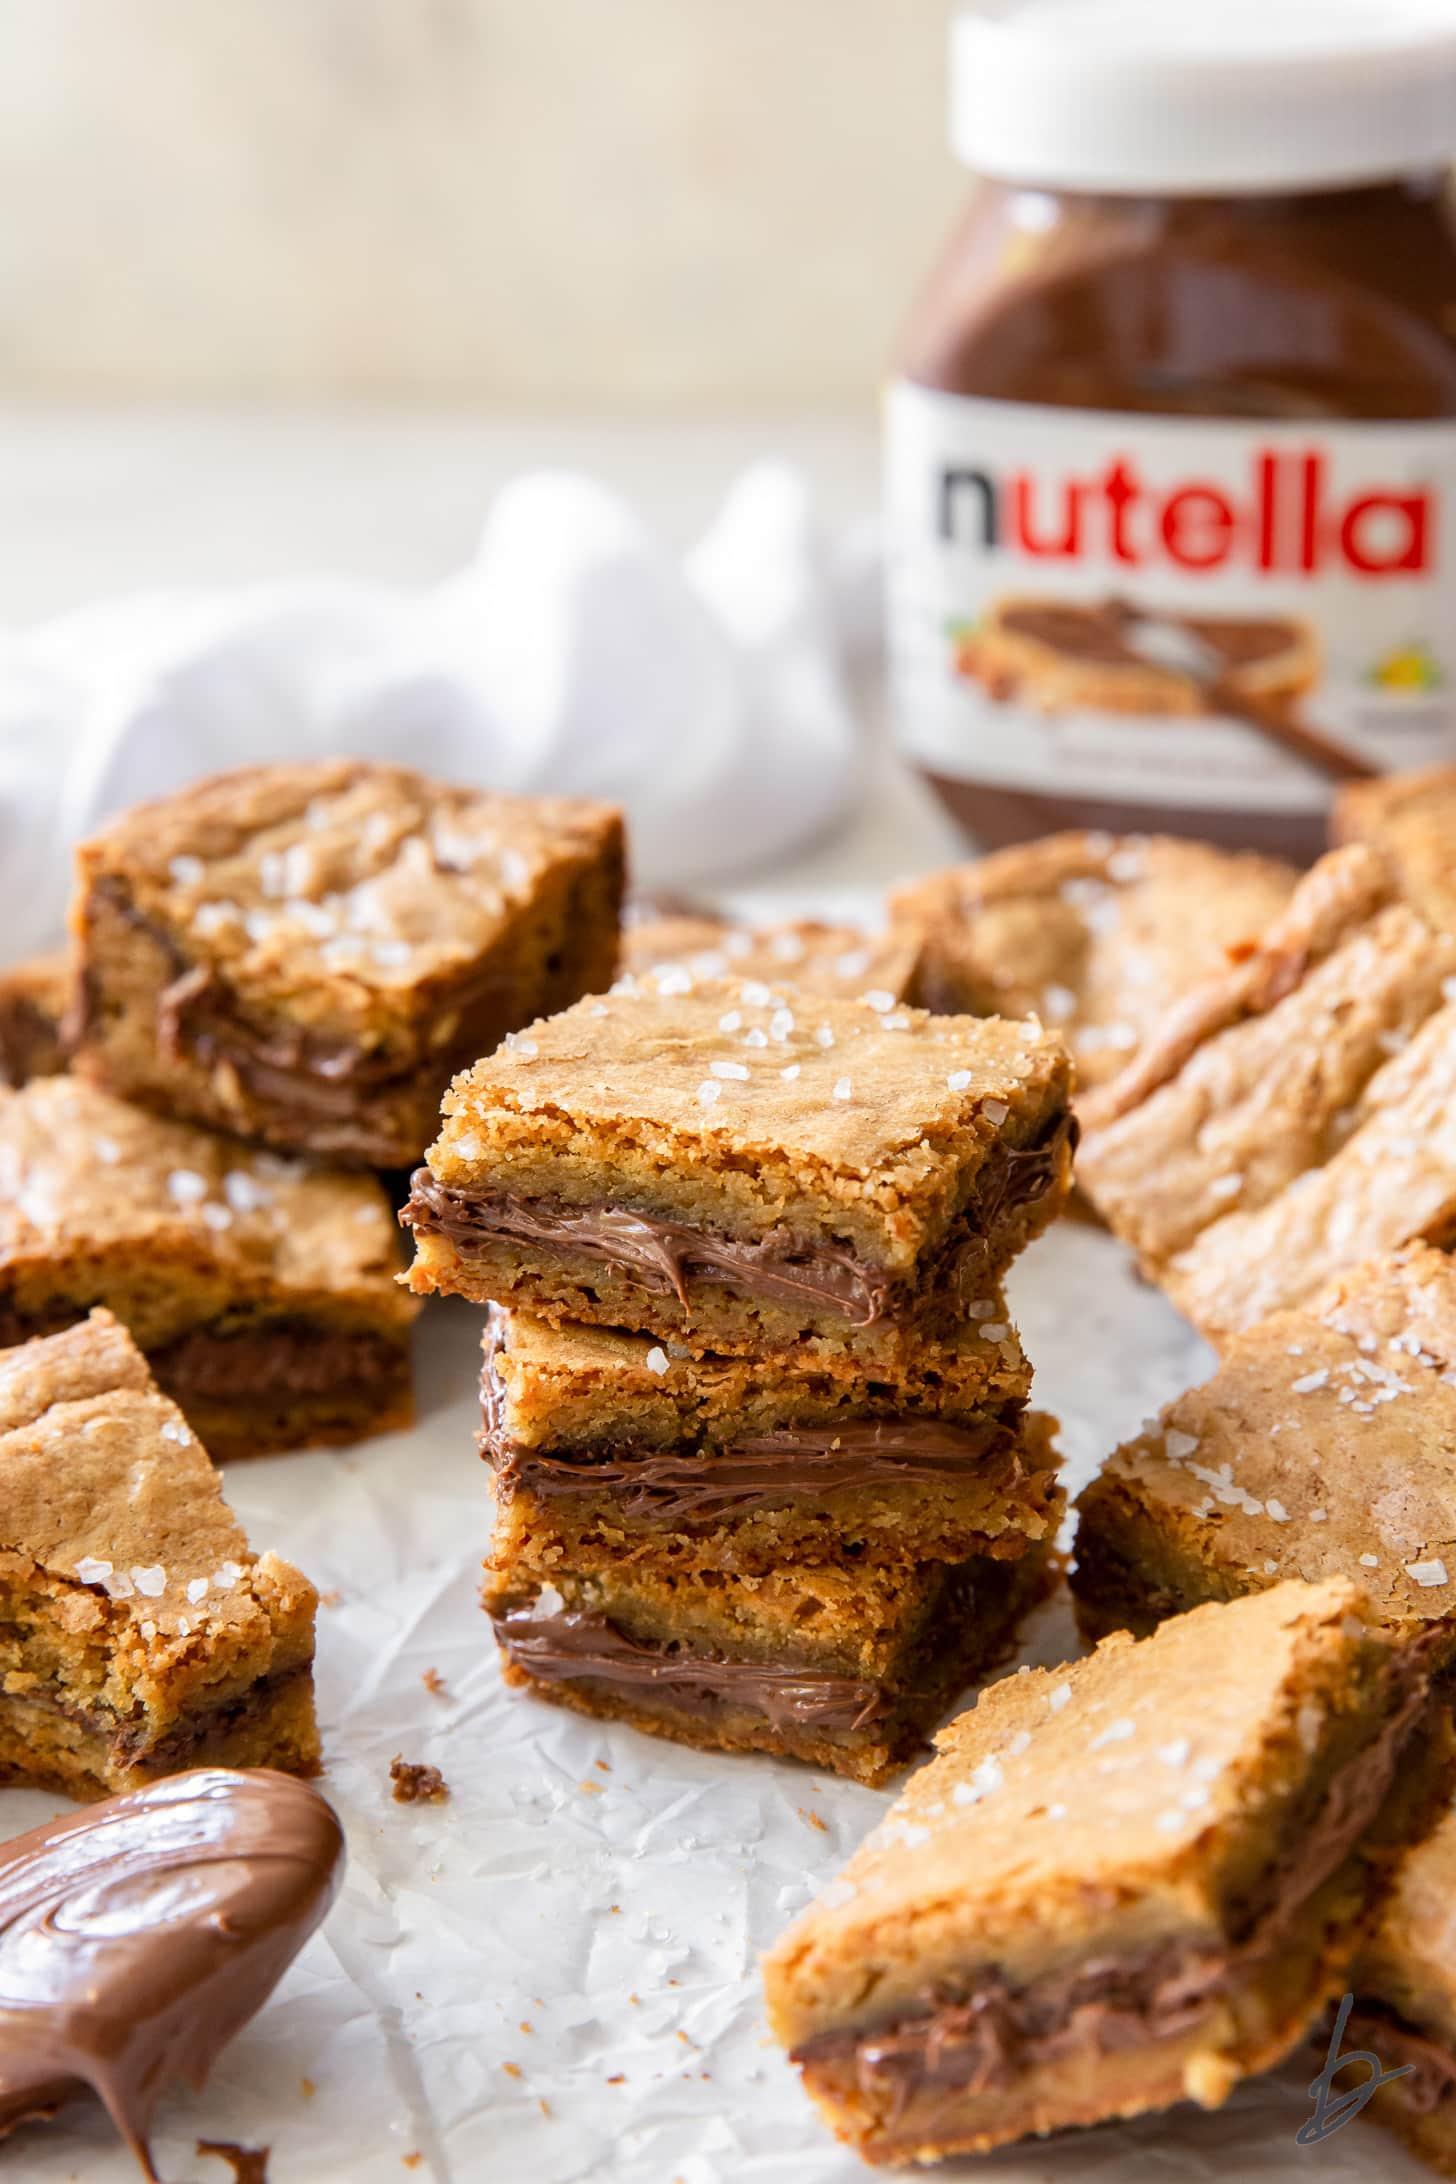 nutella blondies with chocolate hazelnut in the center